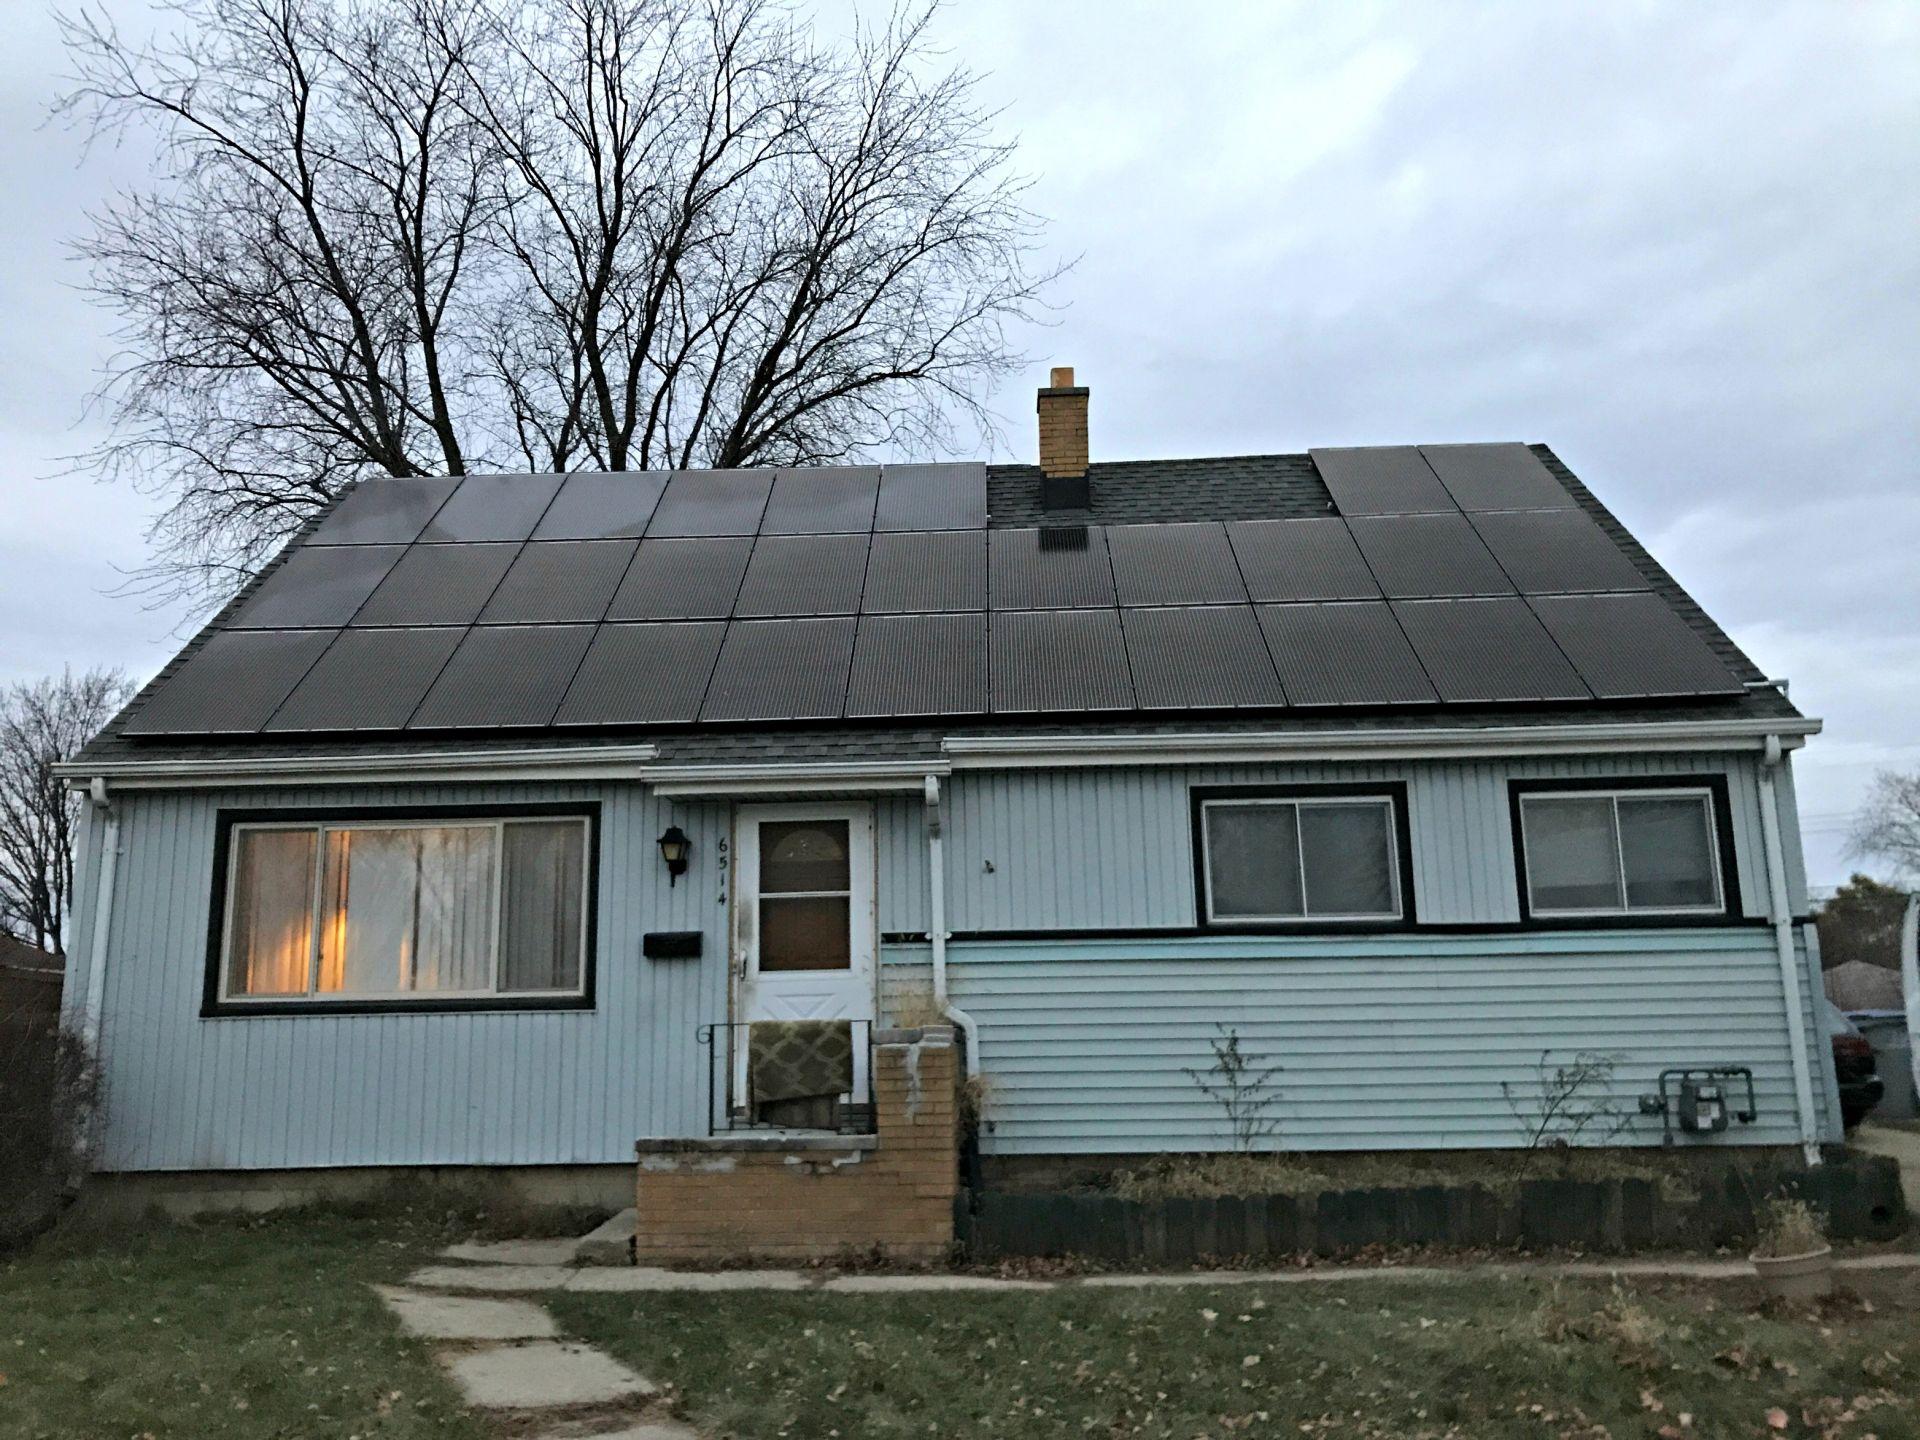 Roof Mount Solar Installation in